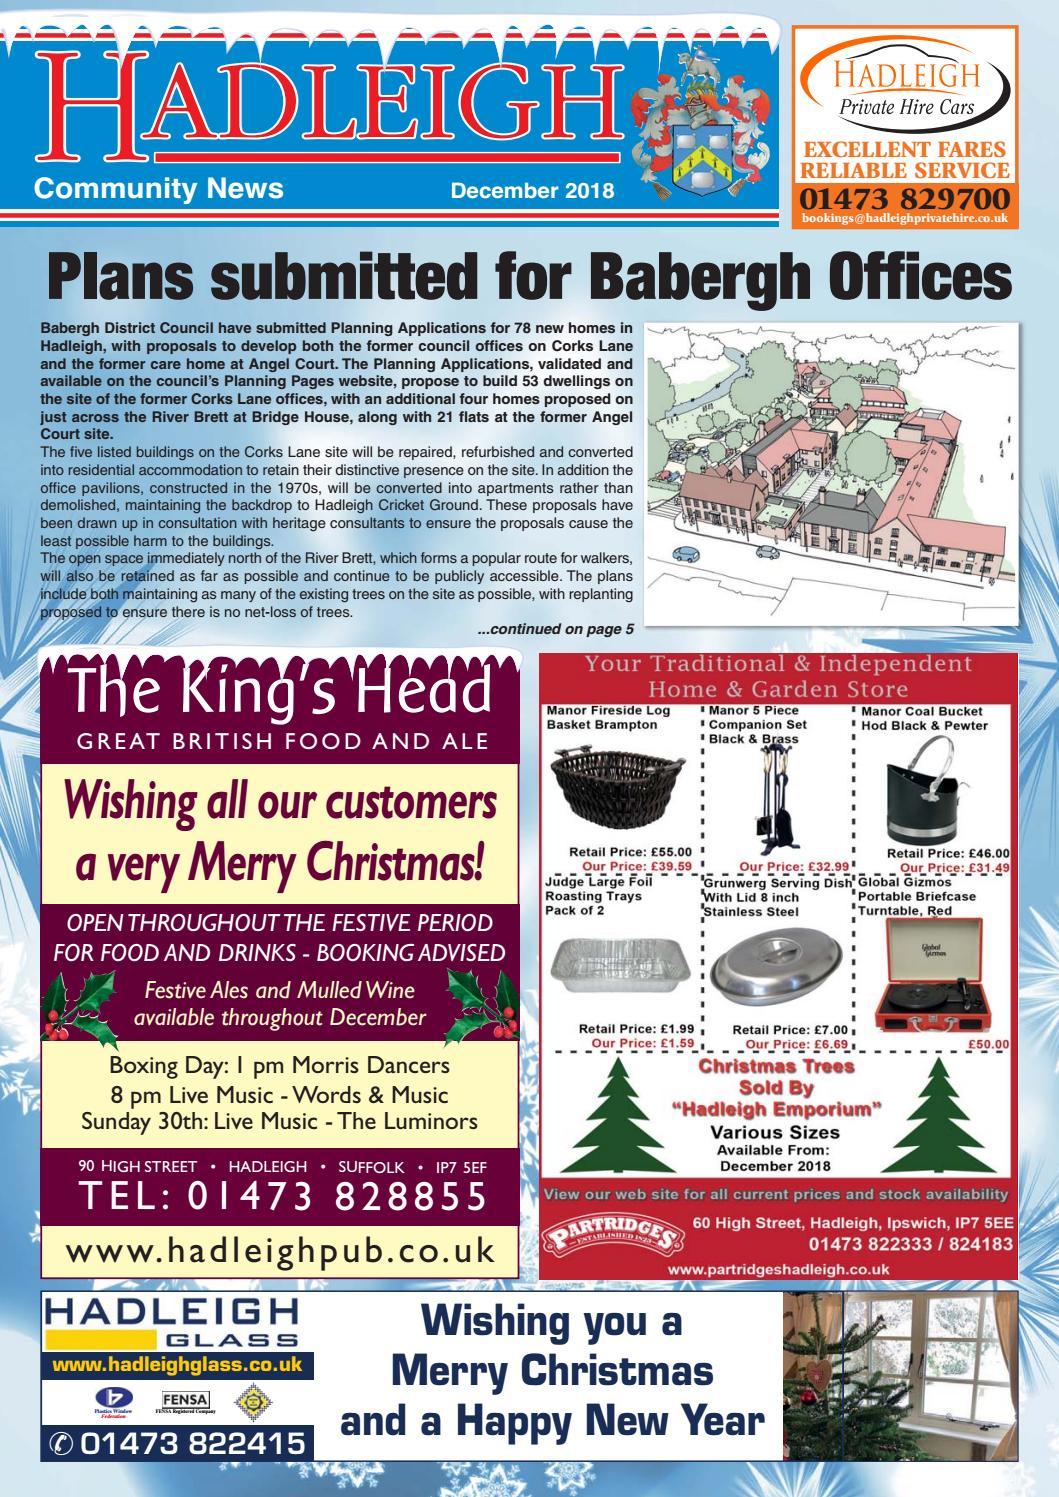 Hadleigh Community News, December 2018 by Keith Avis